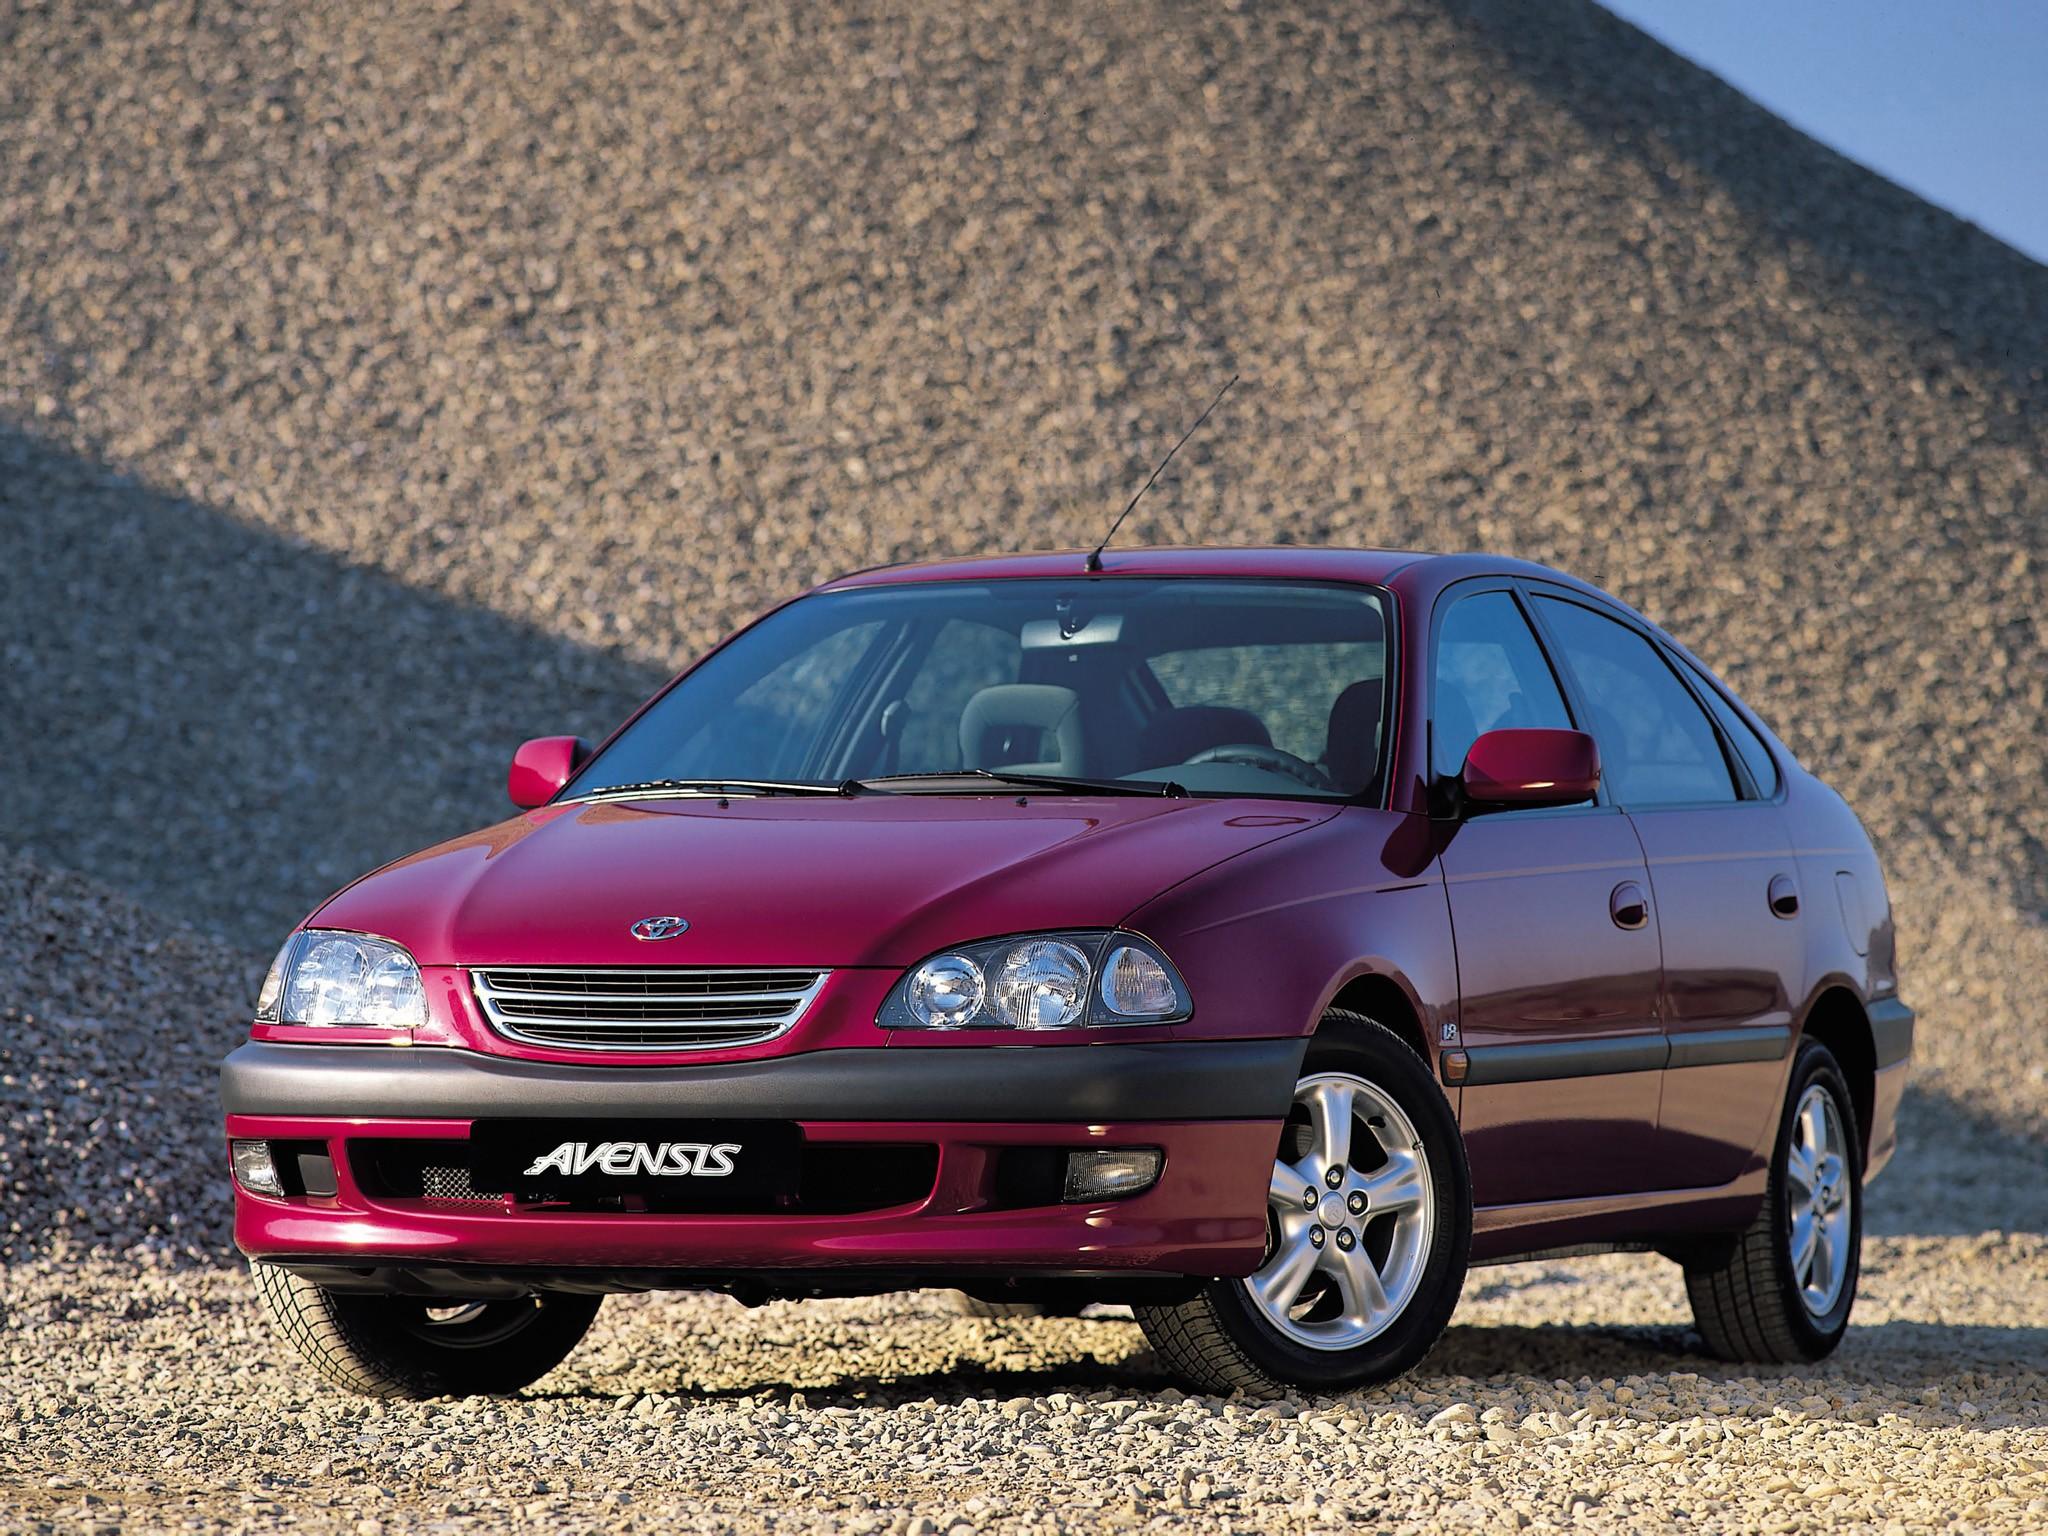 Diesel Wallpaper Cars Toyota Avensis Liftback 1997 1998 1999 2000 2001